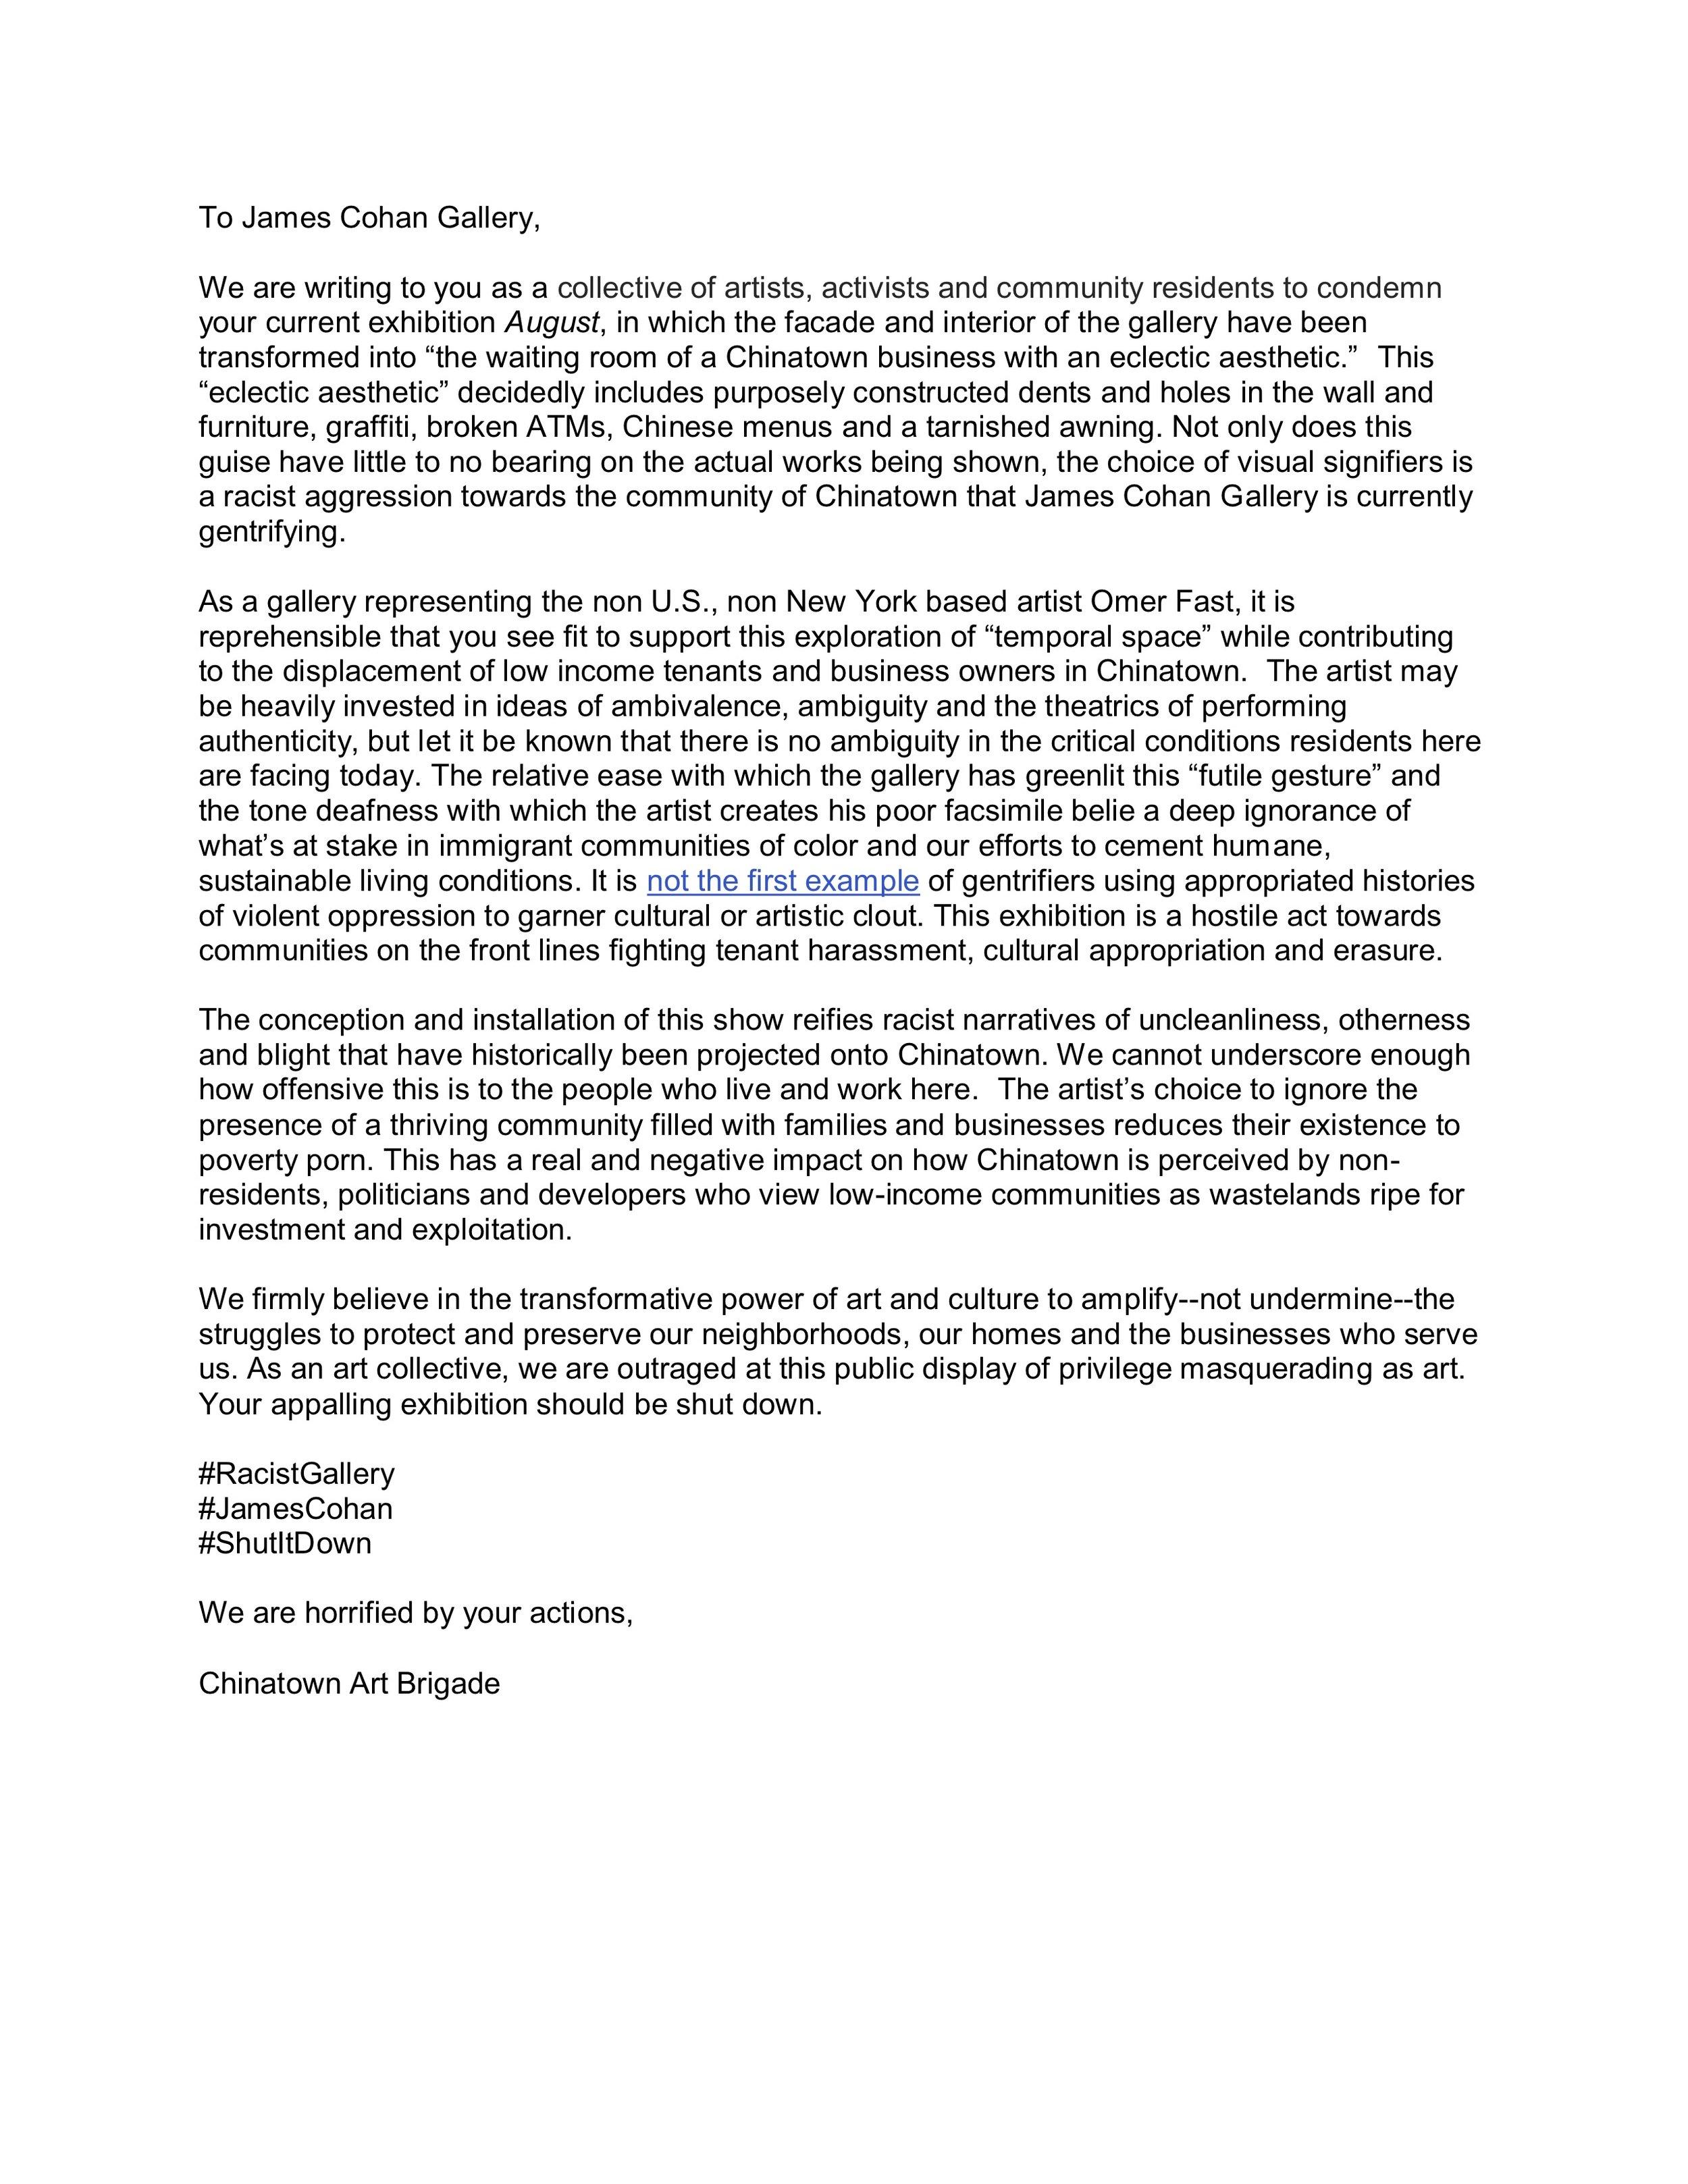 Copy of James Cohan Gallery Letter.jpg